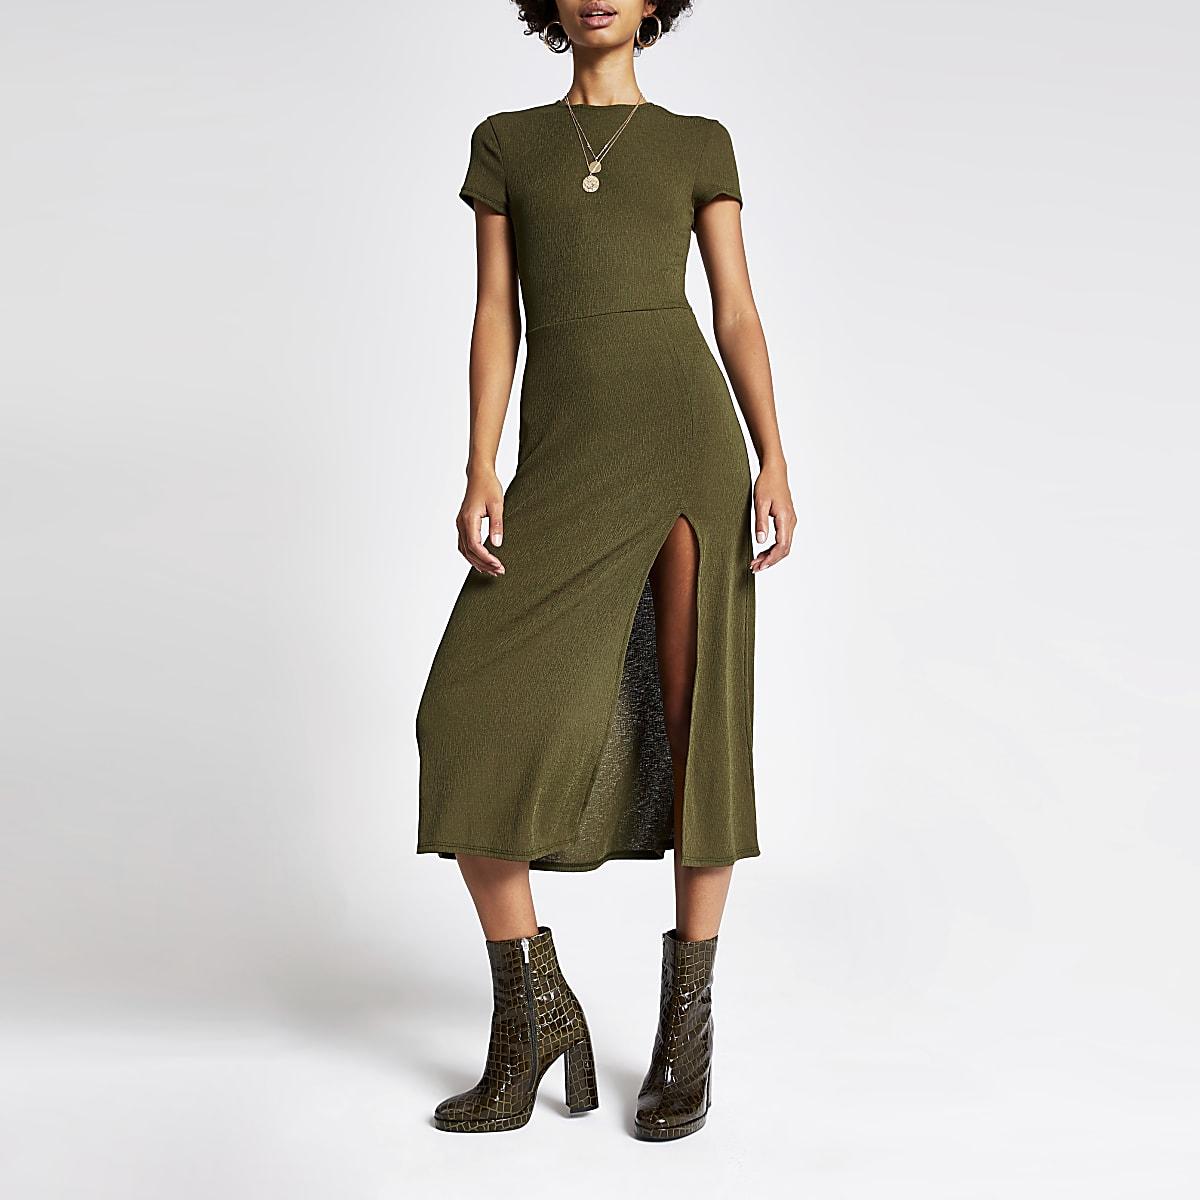 Robe trapèze mi-longue kaki à manches courtes